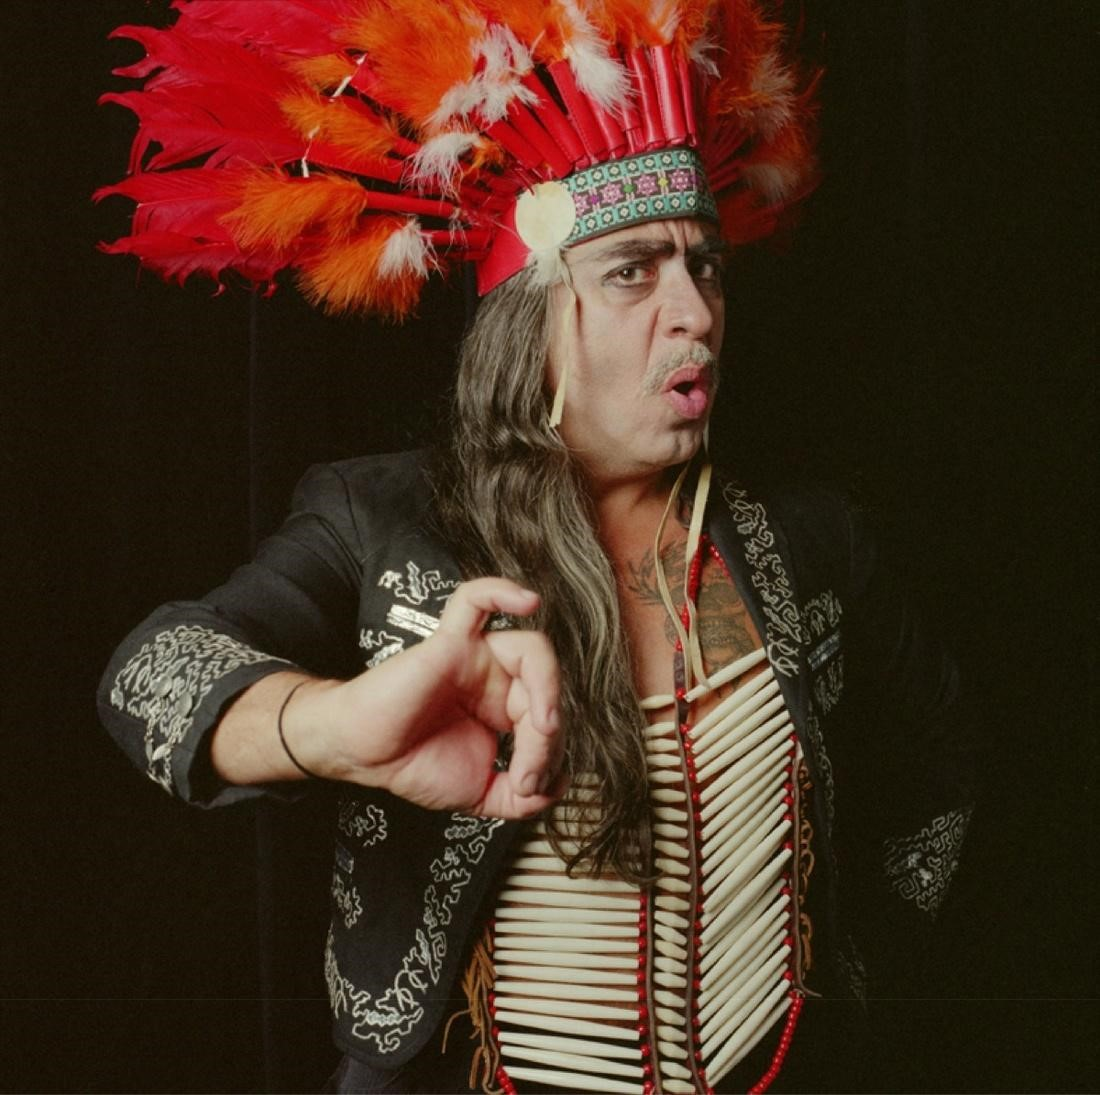 Portrait of Guillermo Gómez-Peña as a deviant shaman. Photo by Chicano photographer Xavier Tavera. Courtesy of La Pocha Nostra.